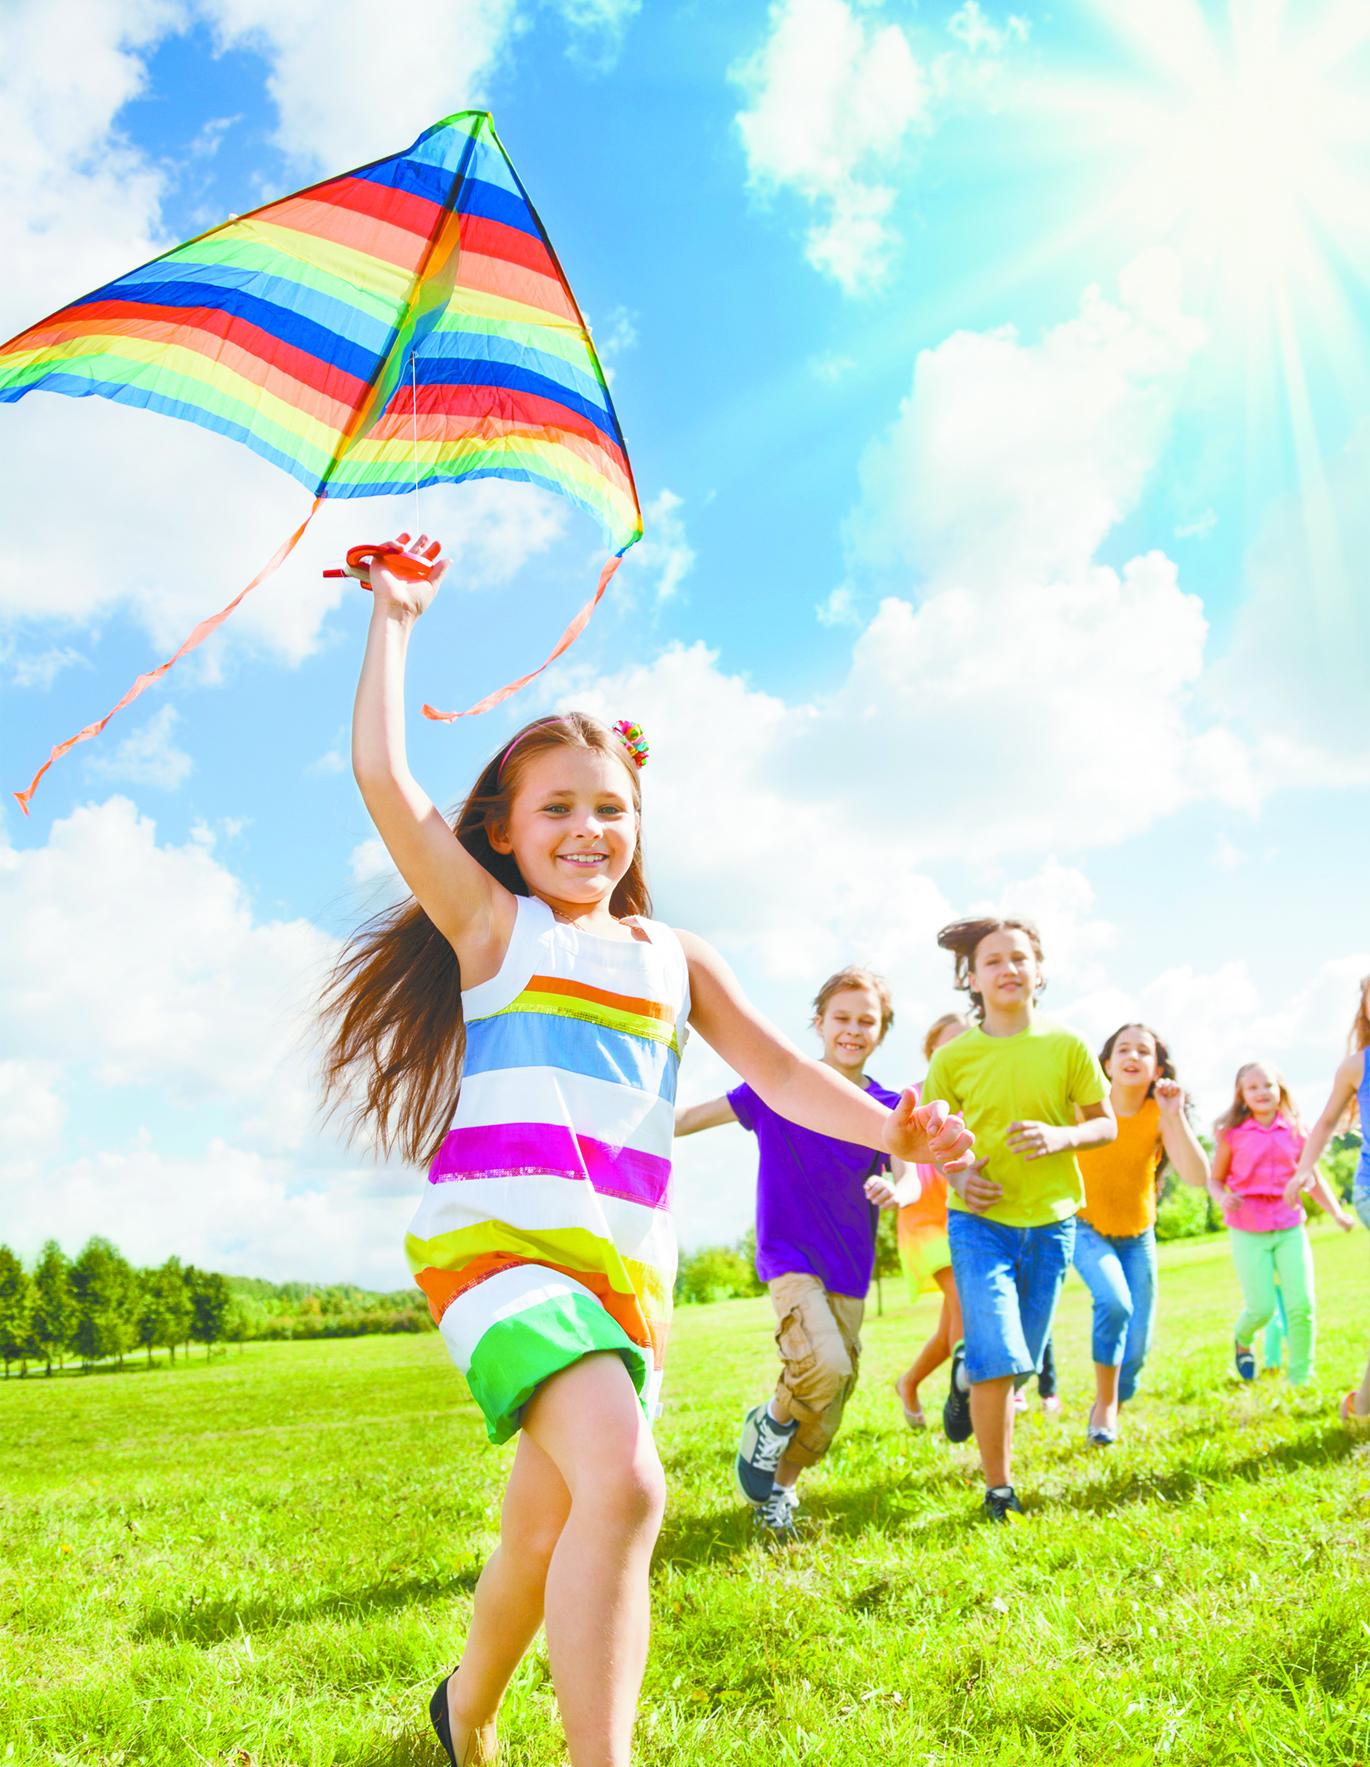 FEWER CHILDREN ARE GETTING MELANOMA